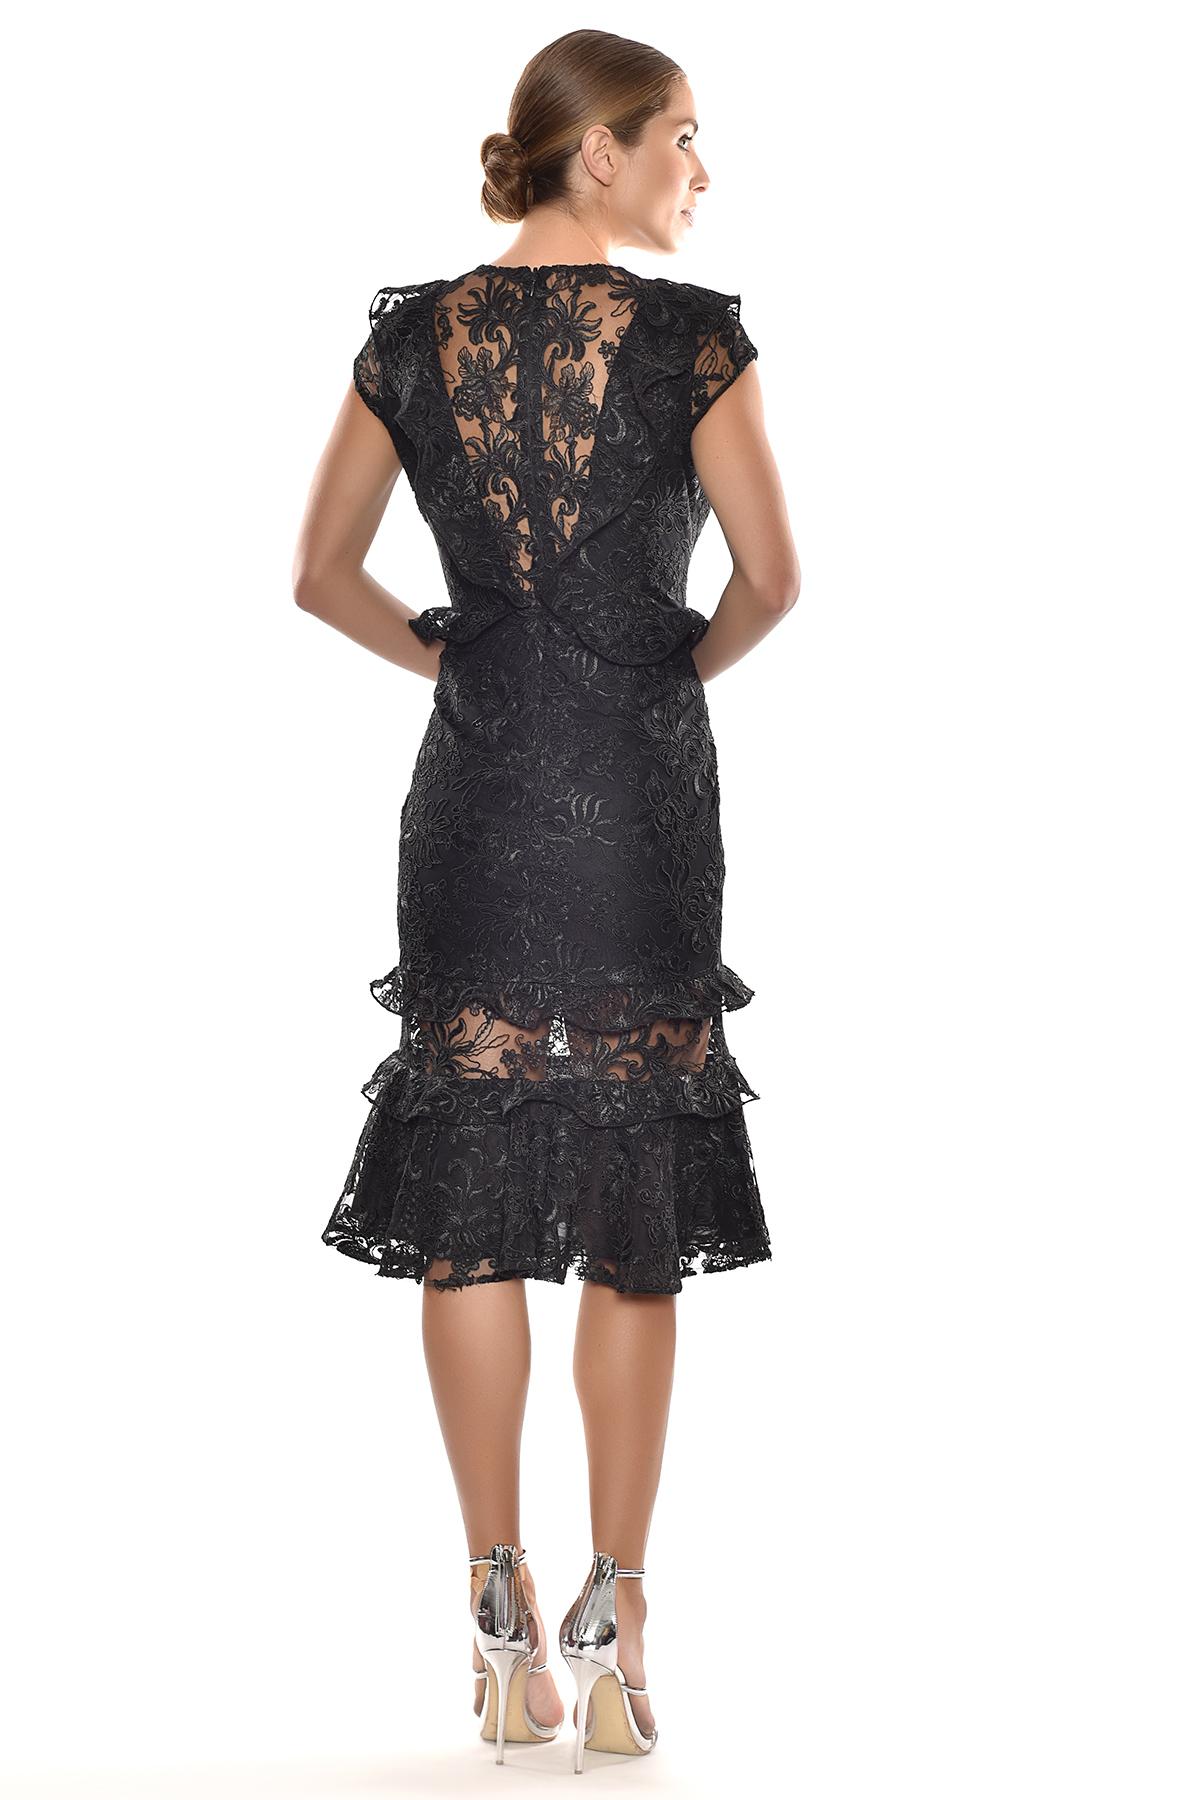 Alfa Beta - Siyah Dantel İşlemeli Kap Kol Midi Boy Elbise (1)